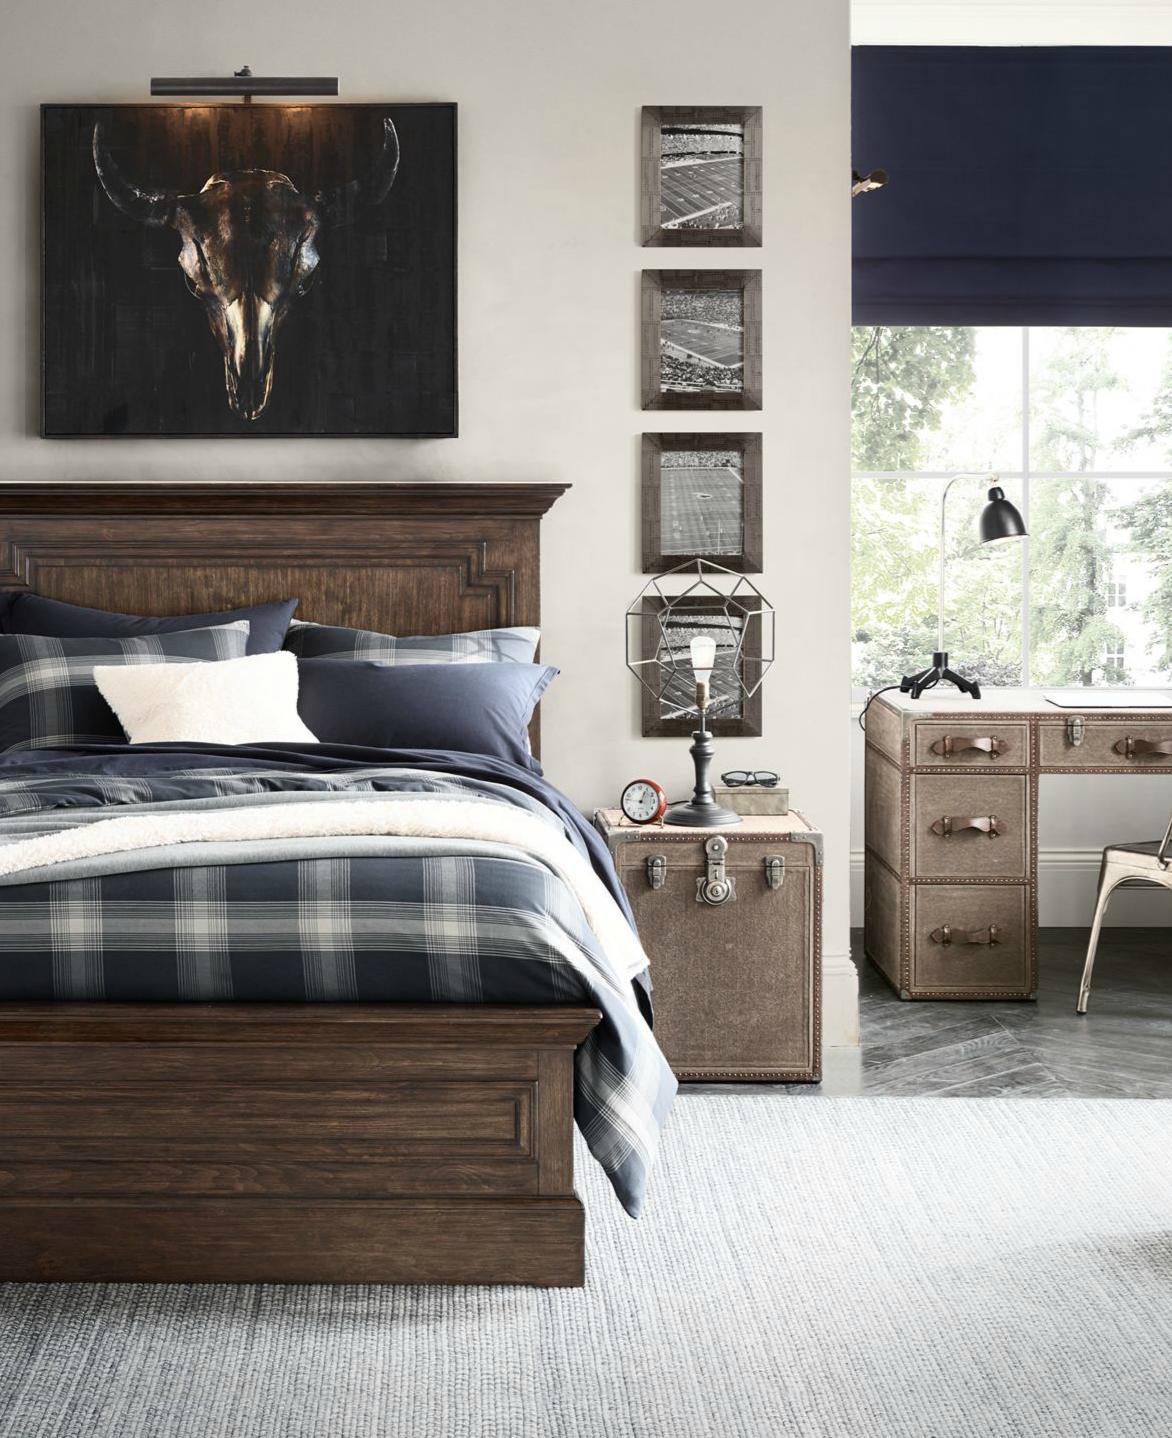 12 Perfect And Calming Bedroom Ideas For Women: 30 Dream Interior Design Teenage Girls Bedroom Ideas